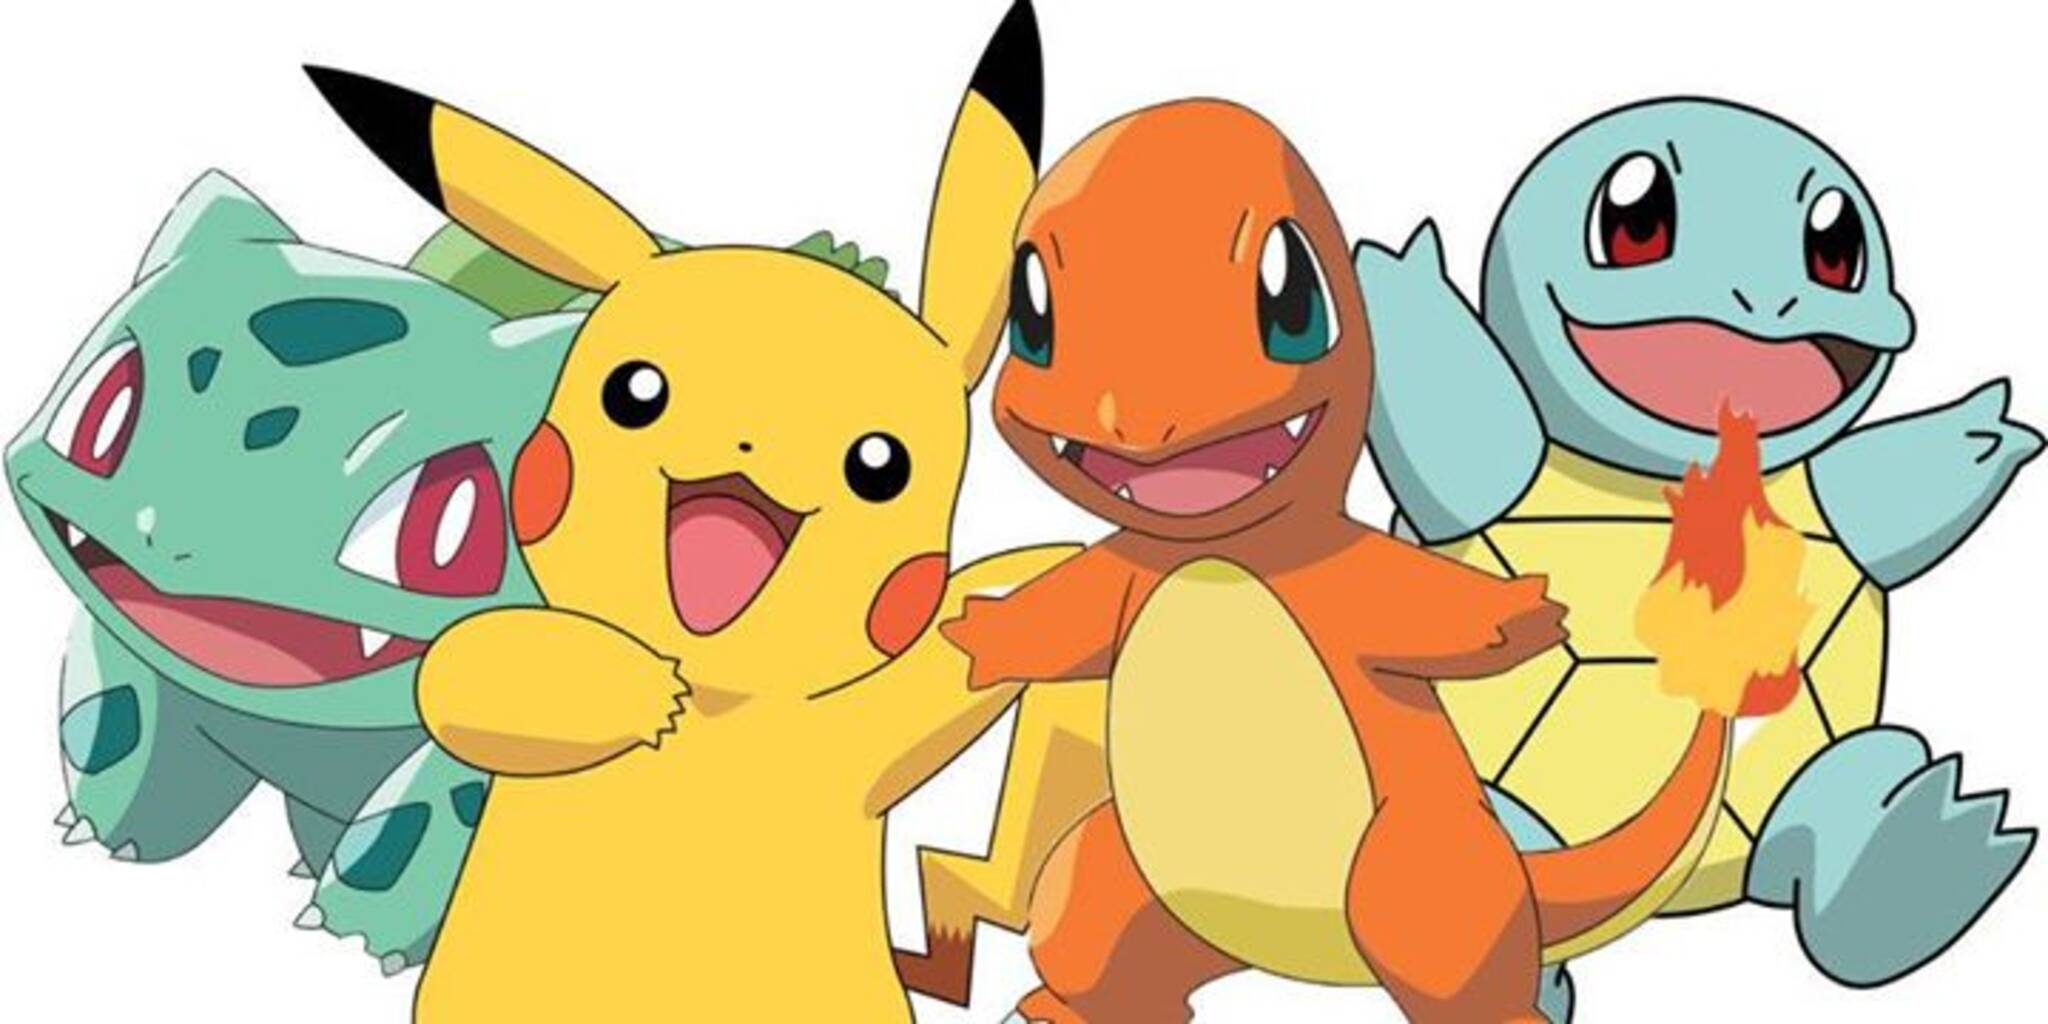 Pokemon Go Crawl